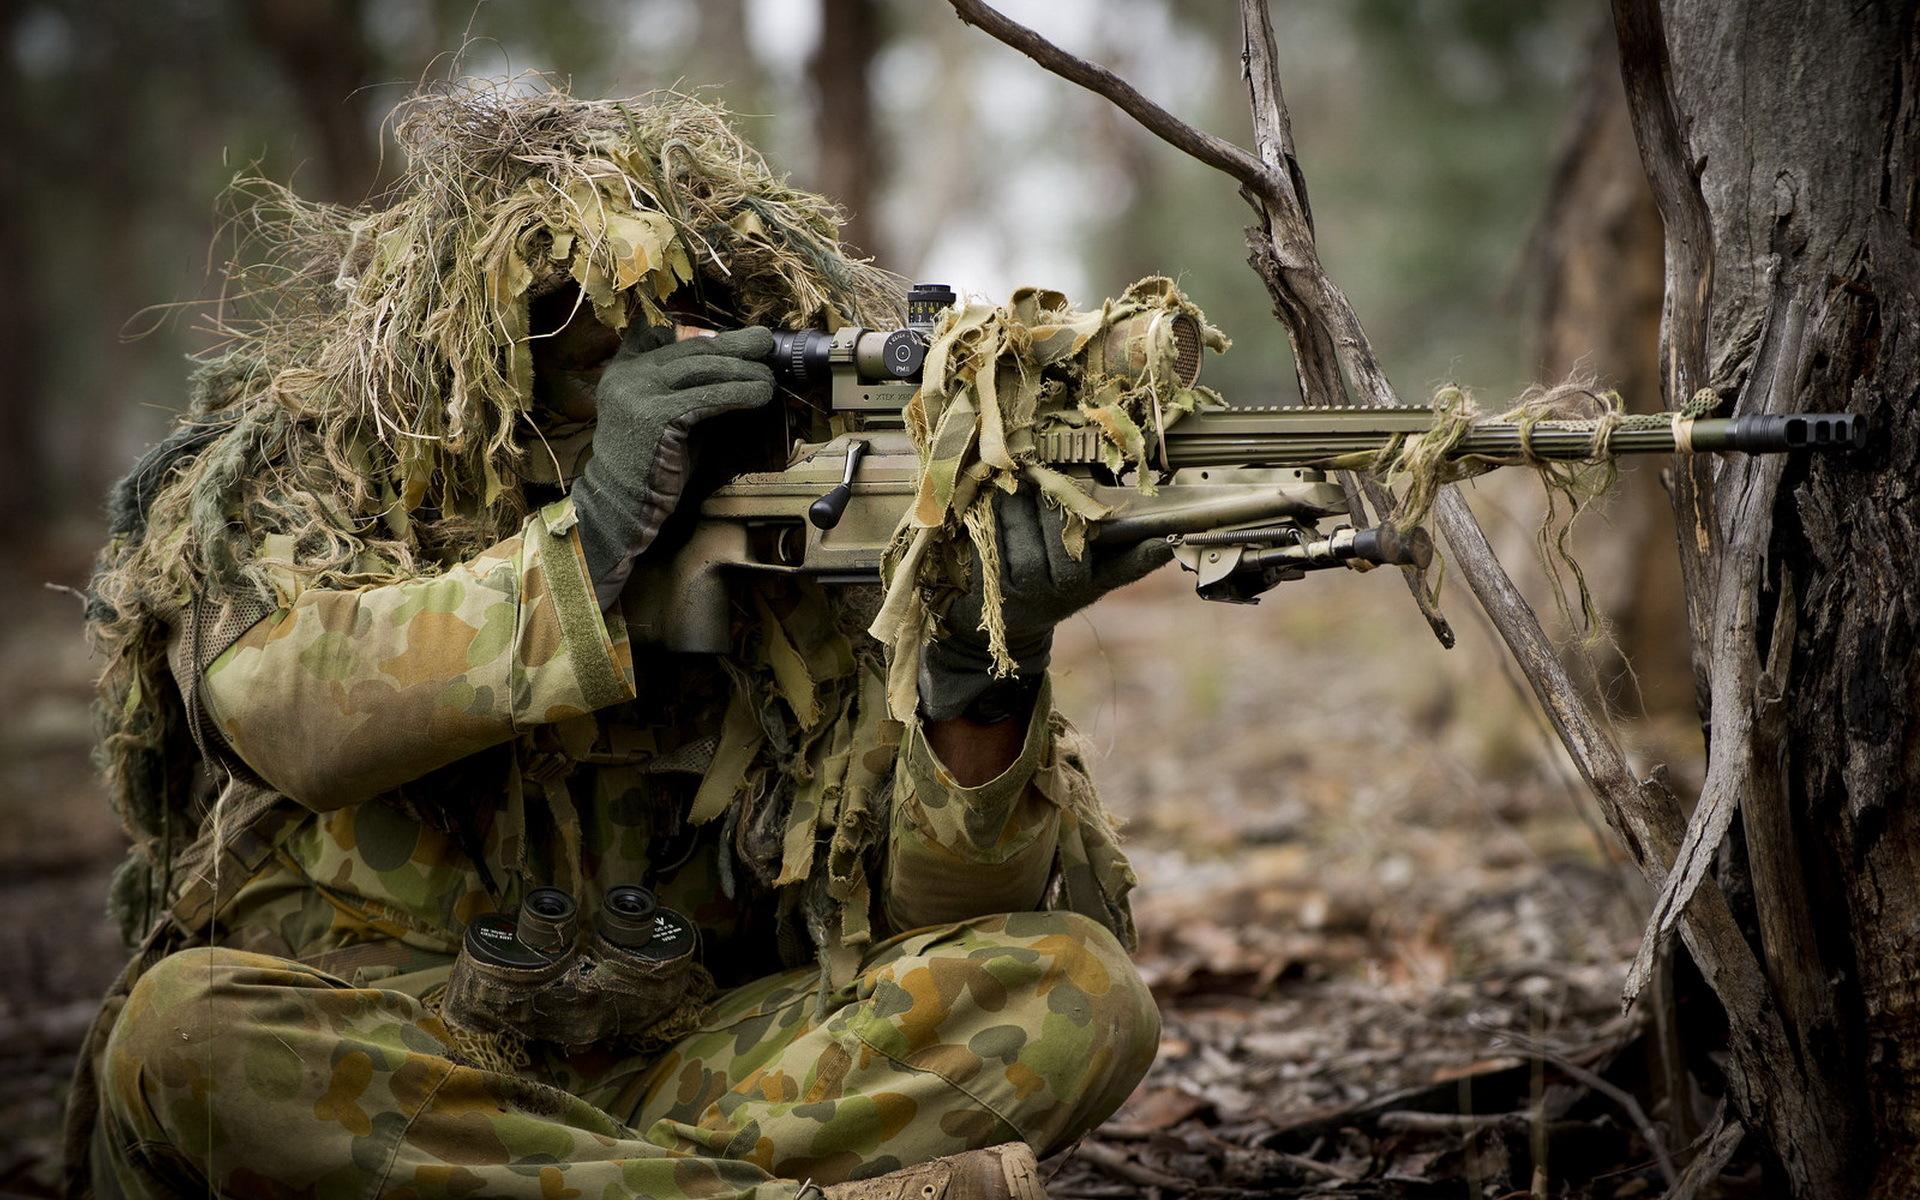 военные картинки снайпера новогодний домик картона